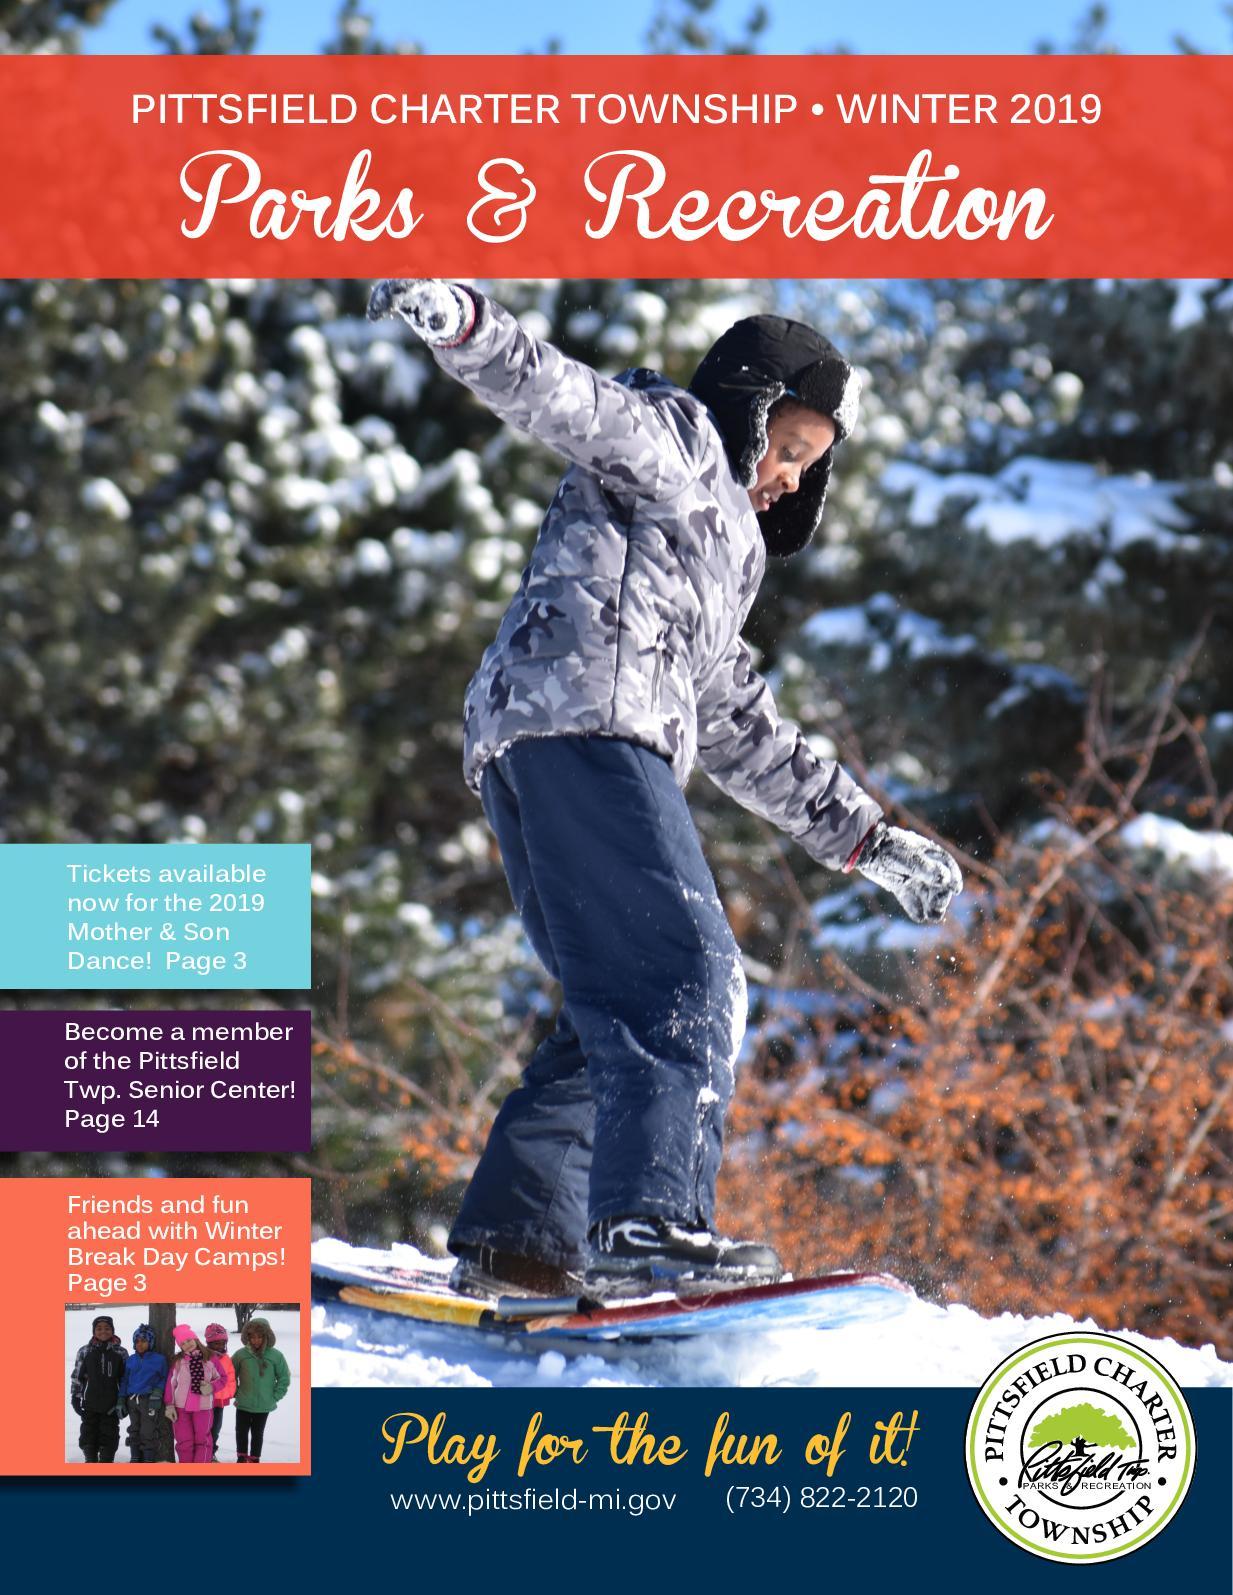 Calaméo - Winter 2019 P&R Brochure